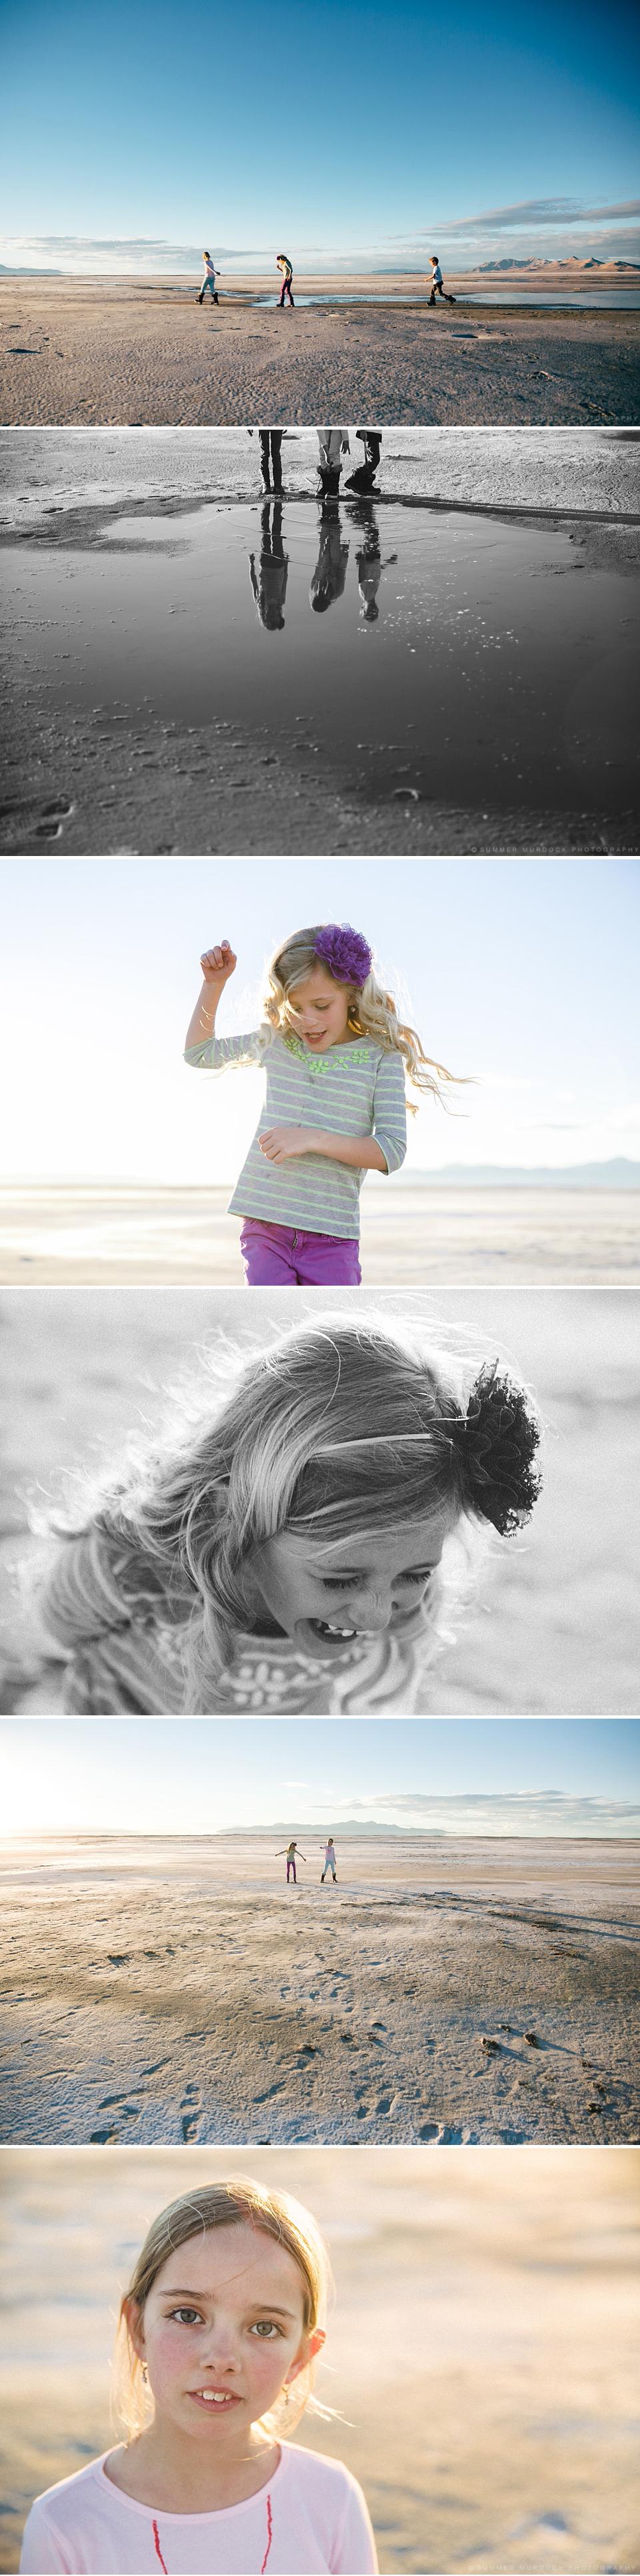 Summer Murdock Photography| SLC, UT Area Photographer